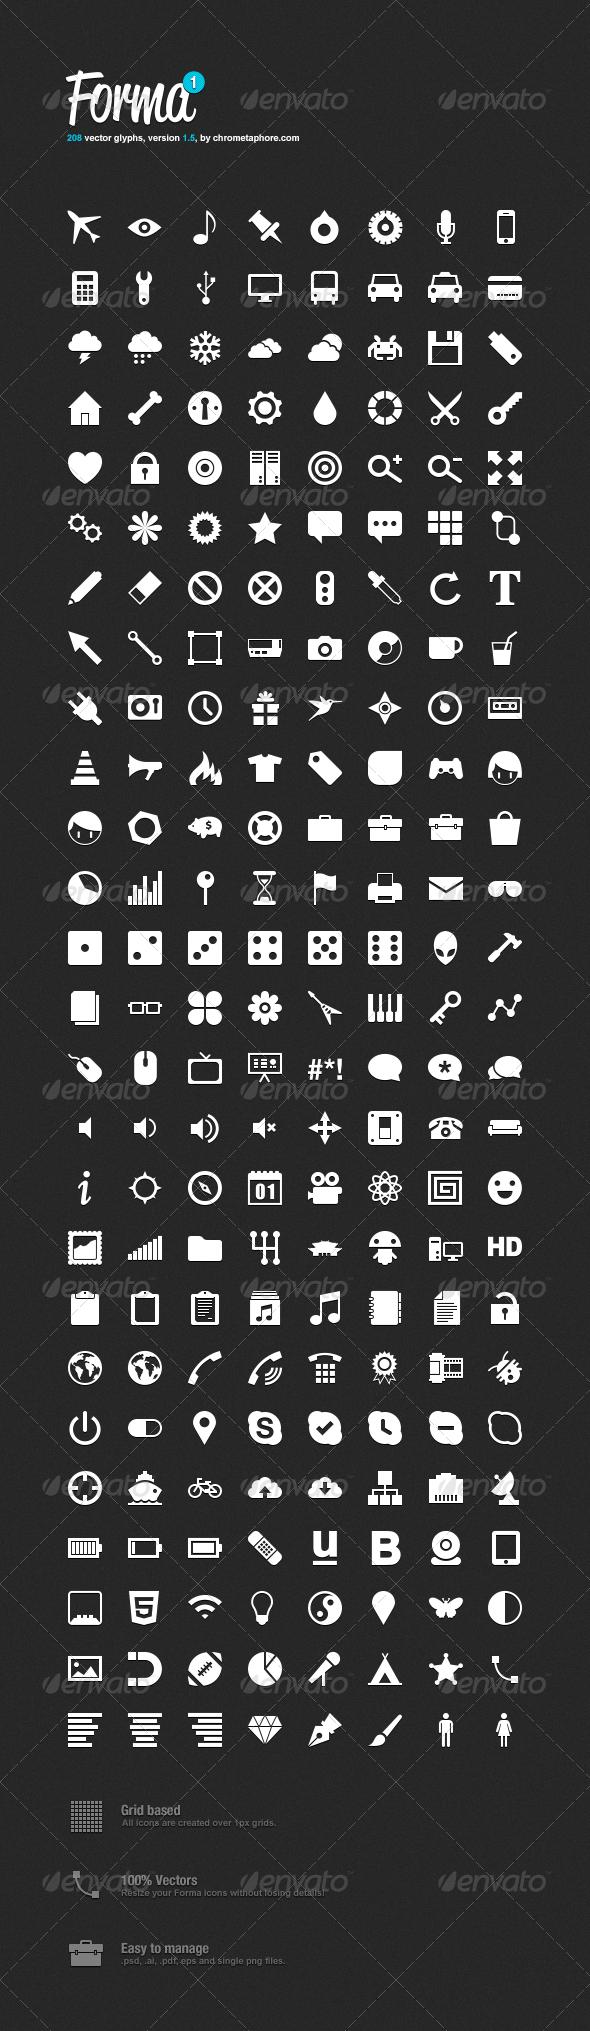 GraphicRiver Forma Icon Pack 1 403562